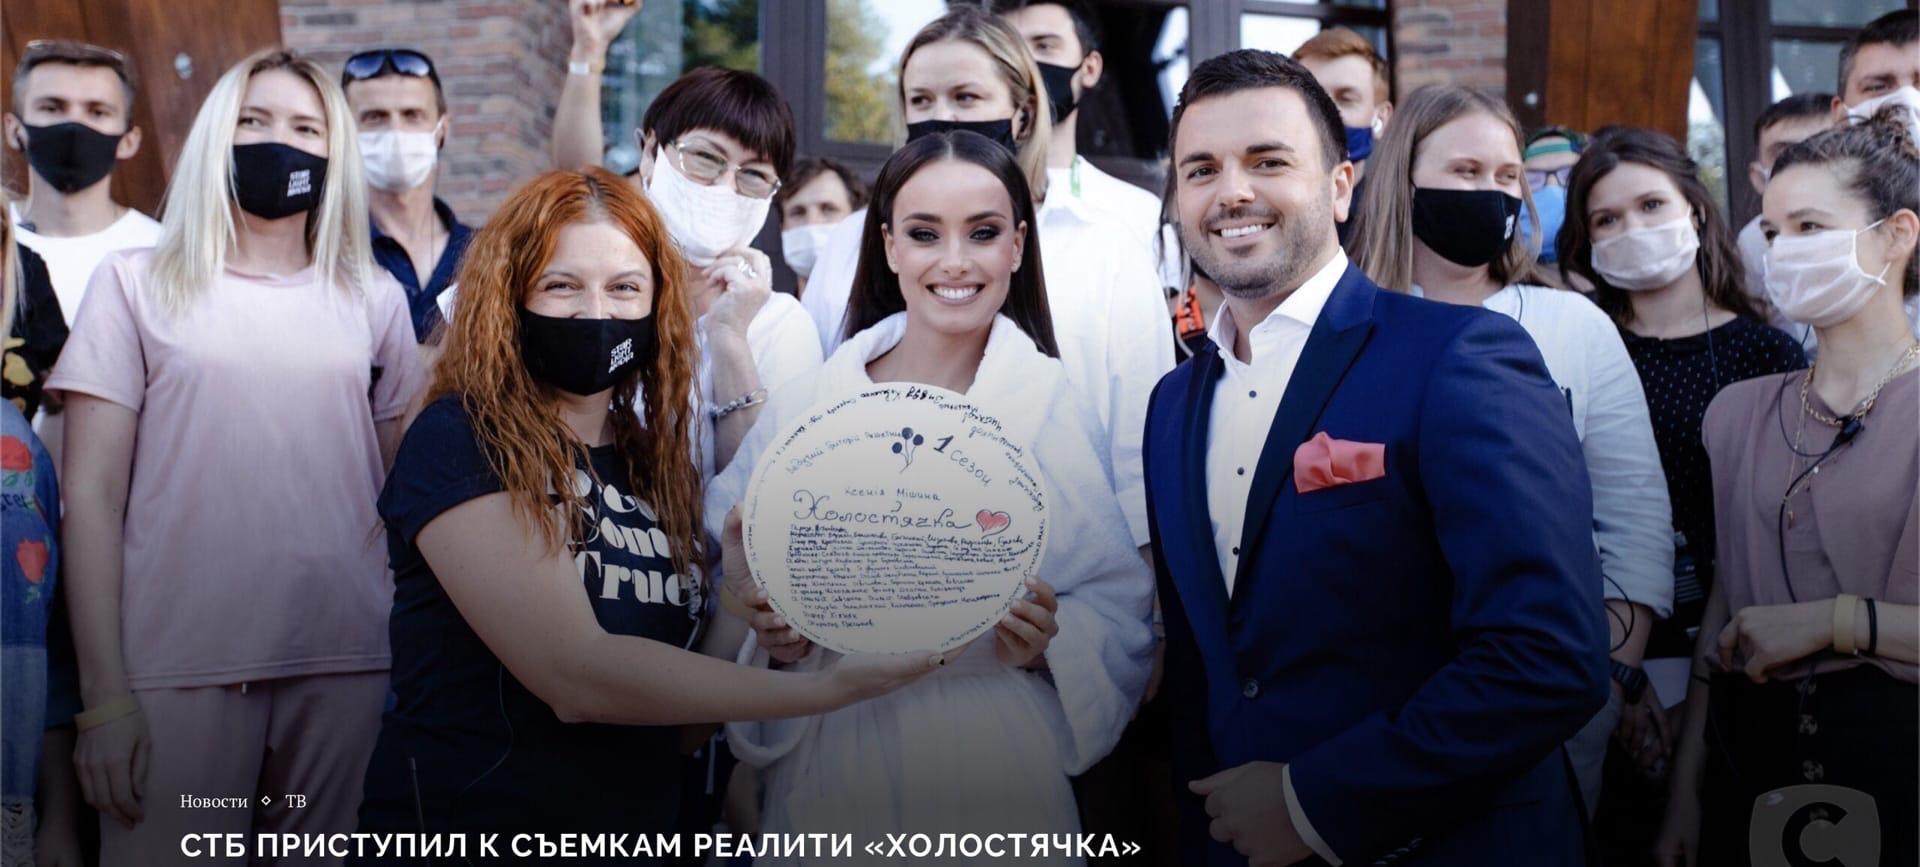 Bachelorette Ukraine - Season 1 - Ksenia Mishina - Discussion - *Sleuthing Spoilers* - Page 2 EuBS1b-Cy04